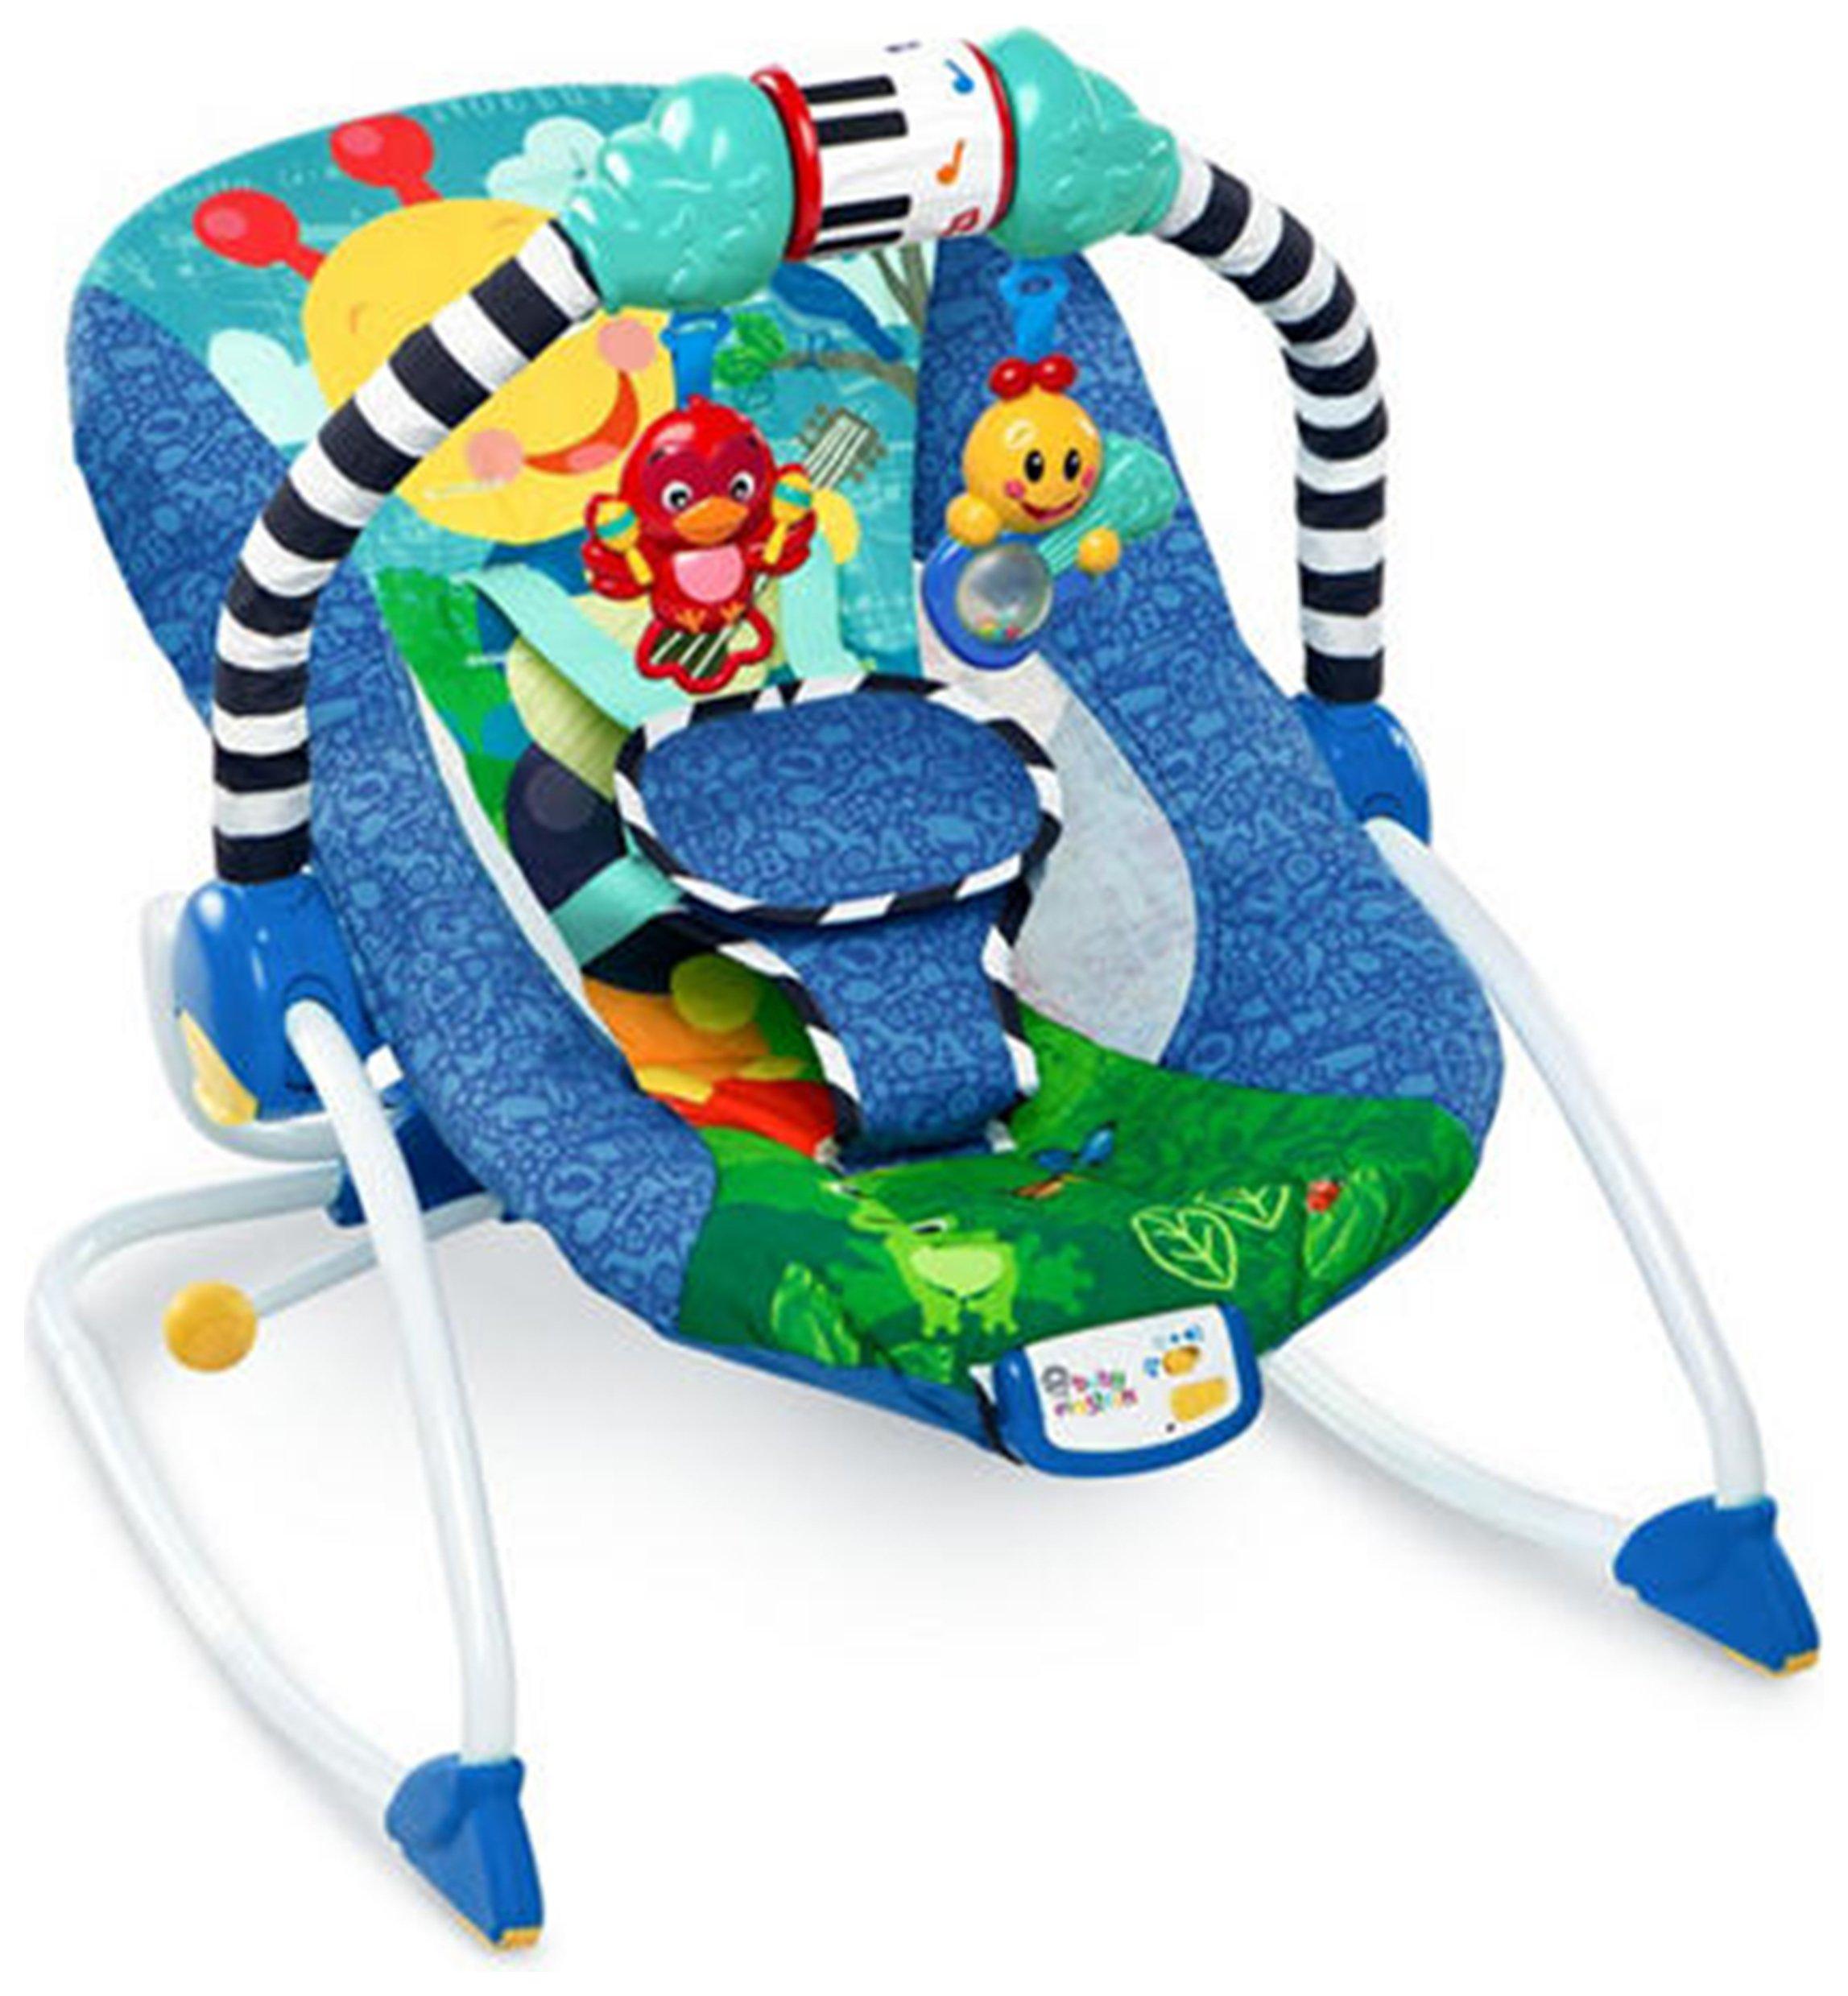 Image of Baby Einstein Symphony Rocker